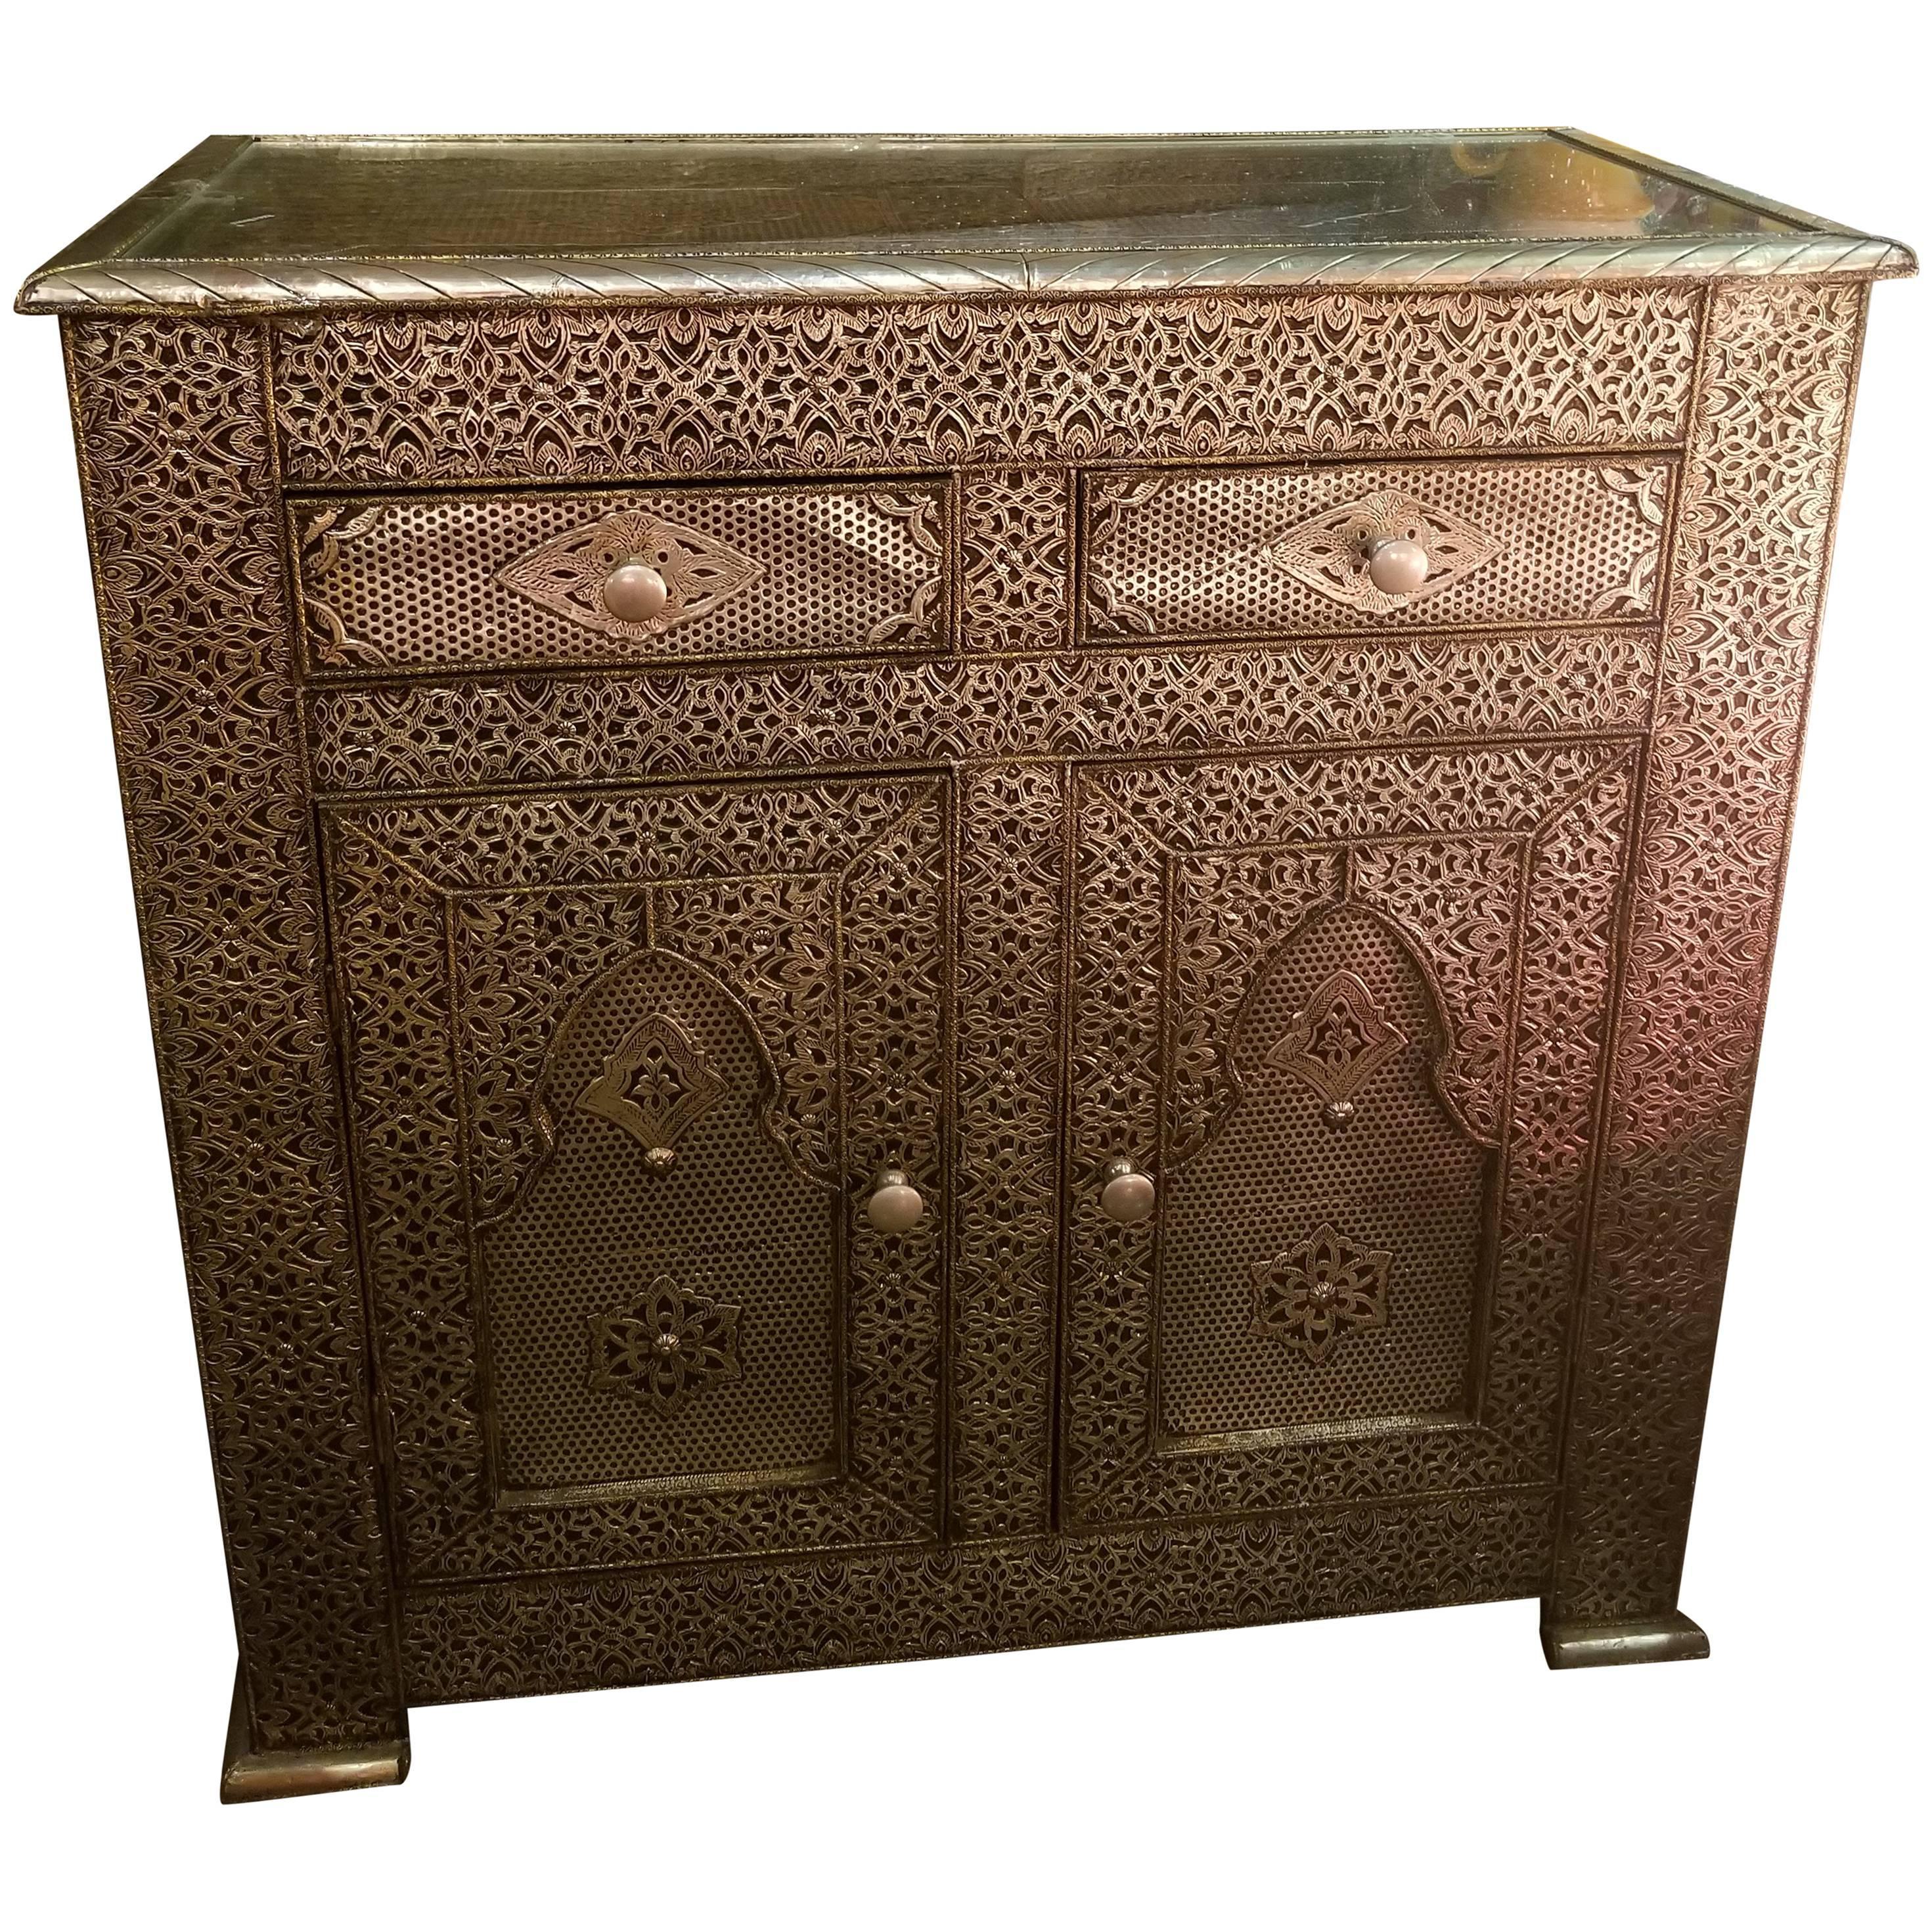 Ordinaire Metal Inlaid Moroccan Cabinet, Plenty Of Storage